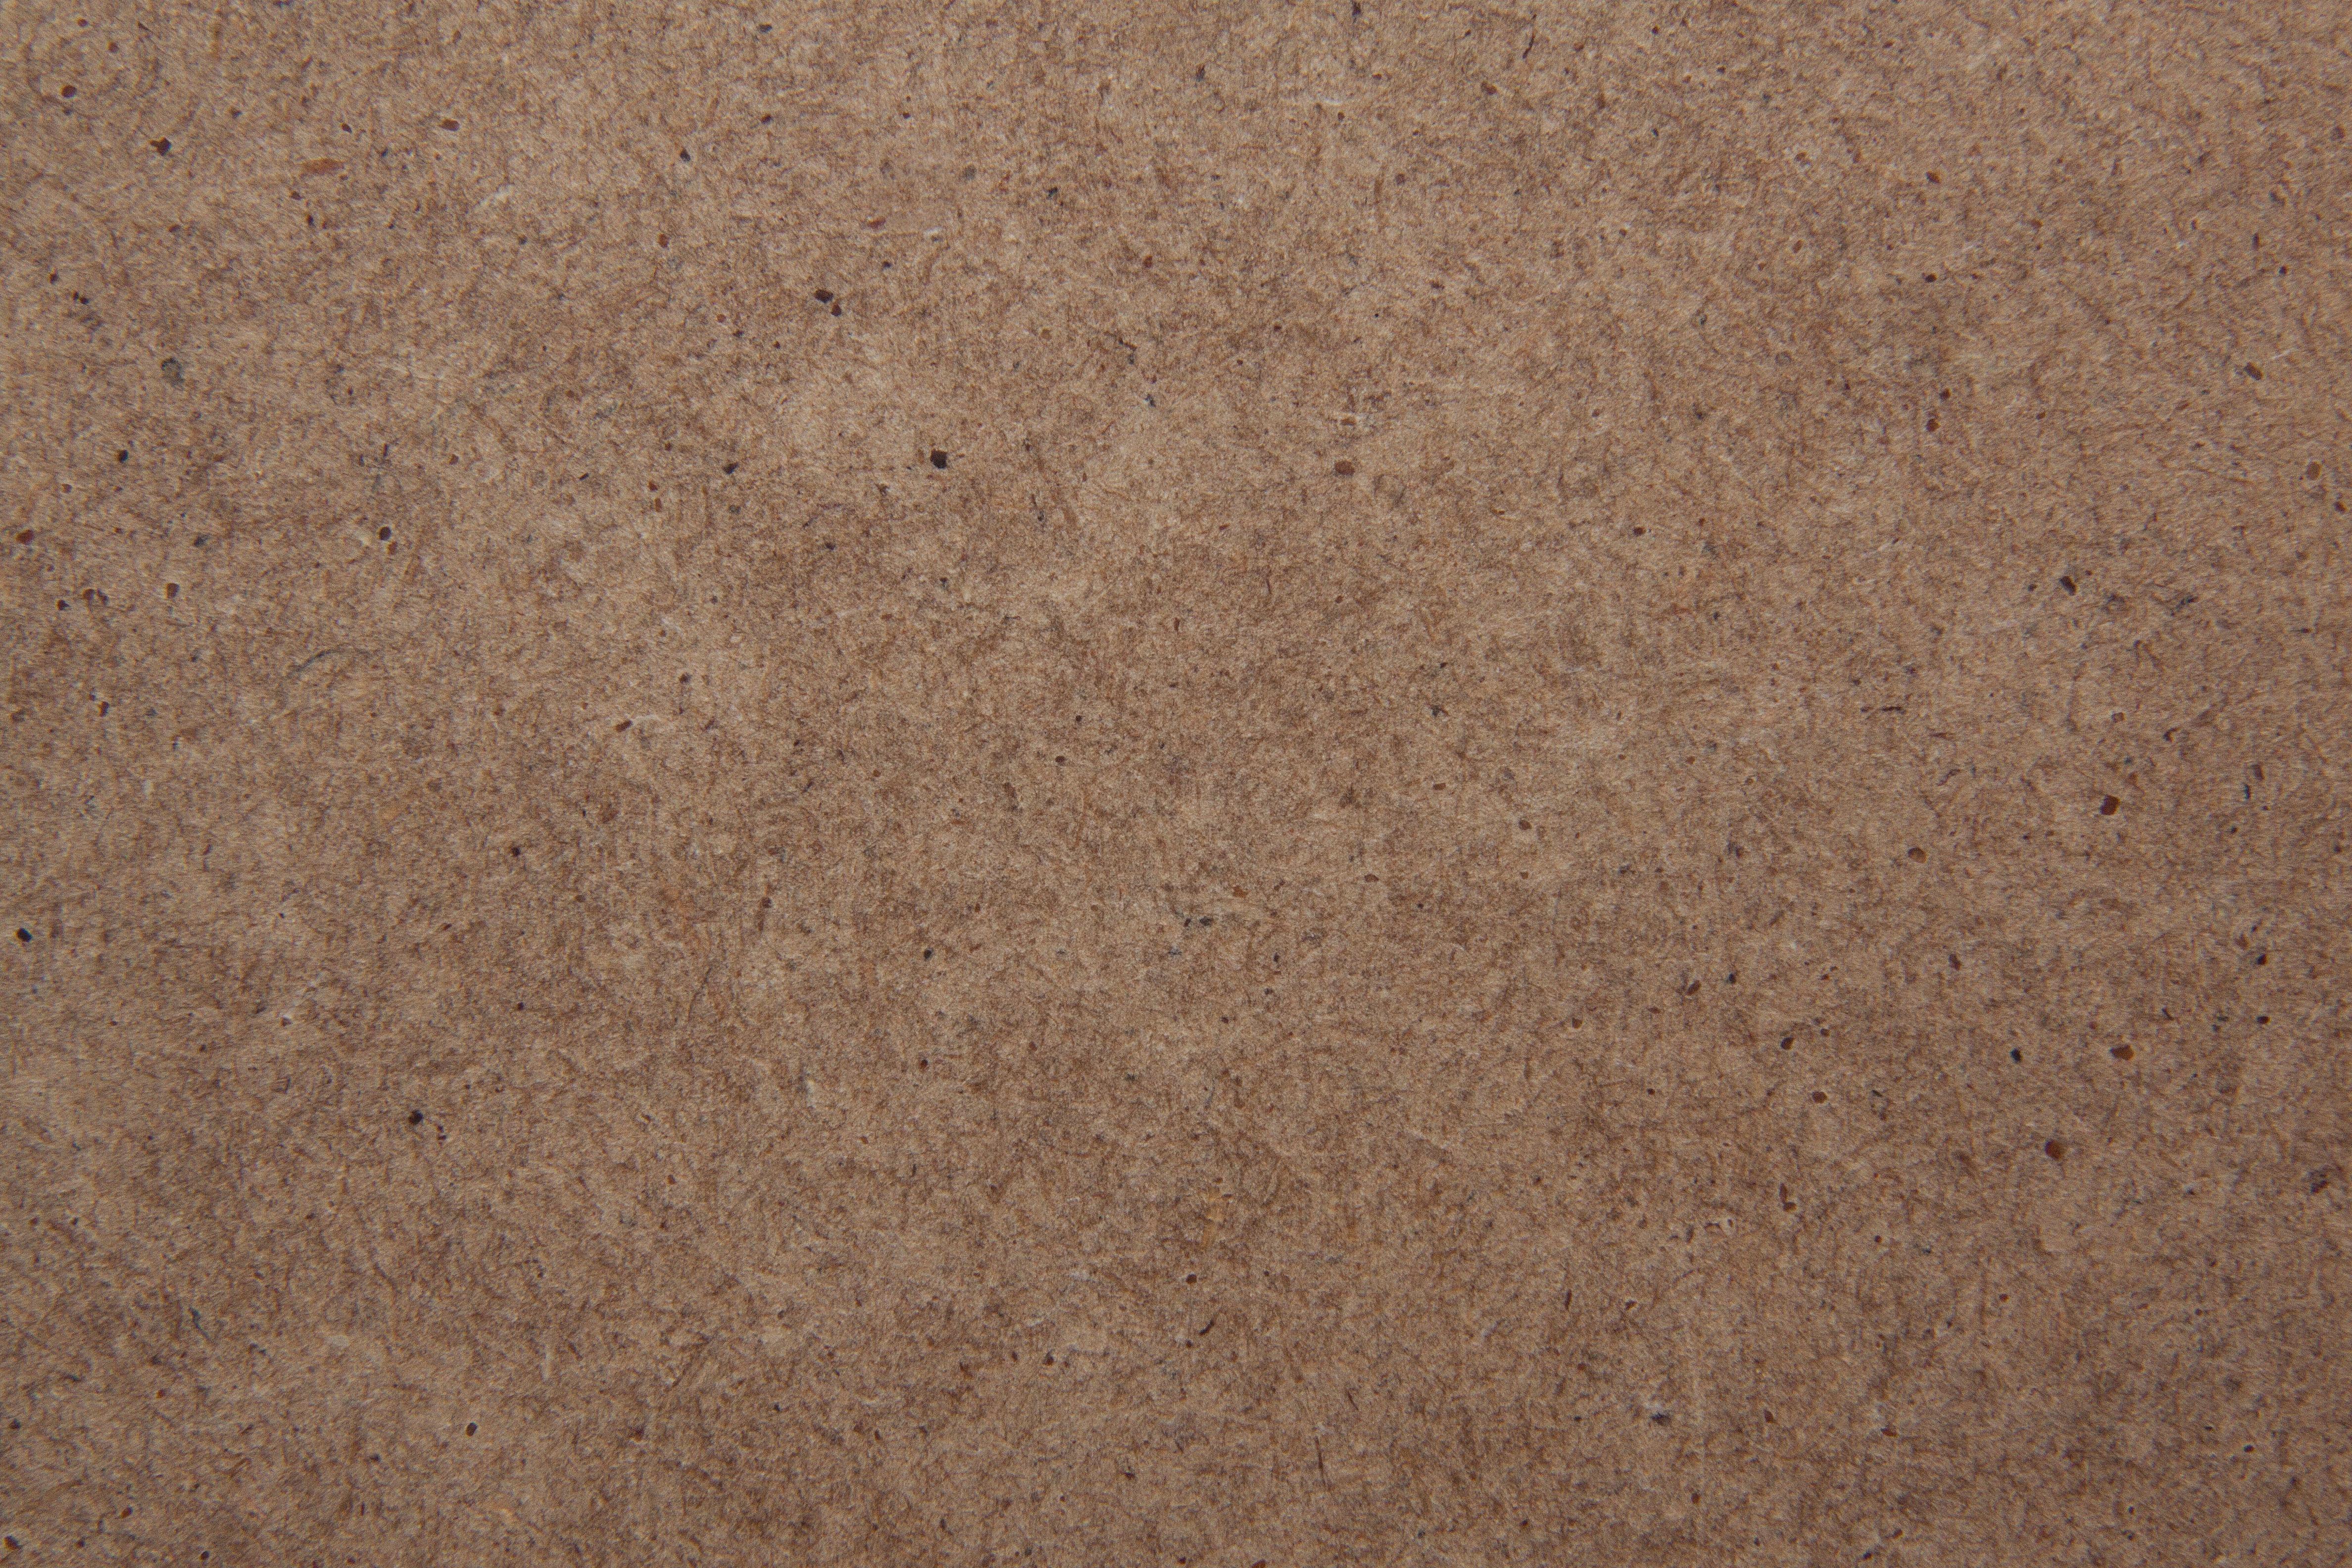 free images sand structure wood floor plate brown. Black Bedroom Furniture Sets. Home Design Ideas